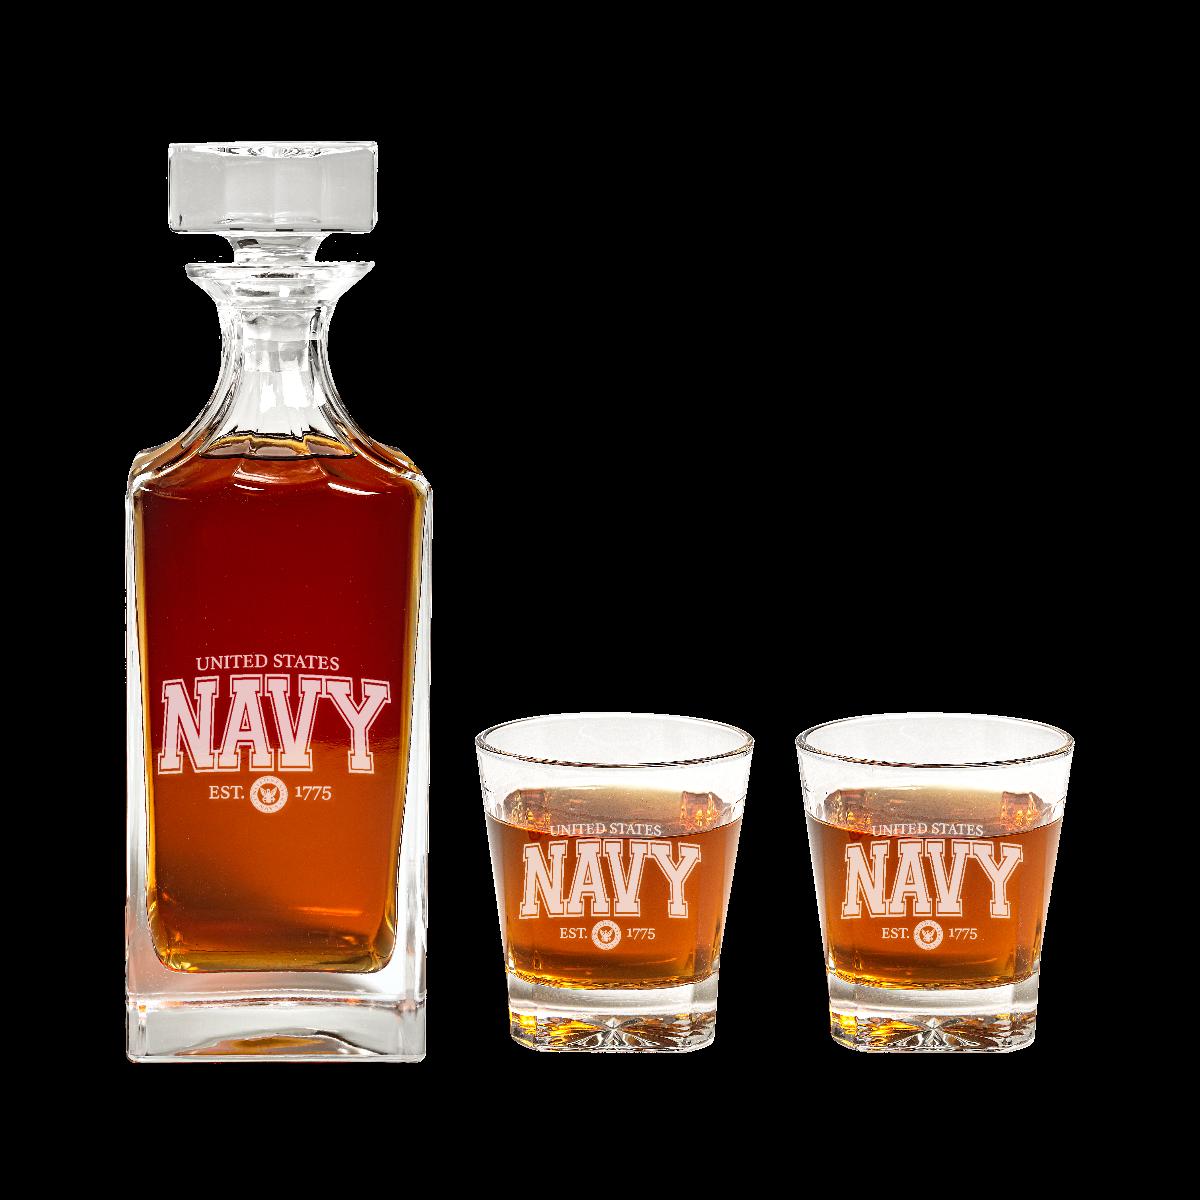 navy decanter set